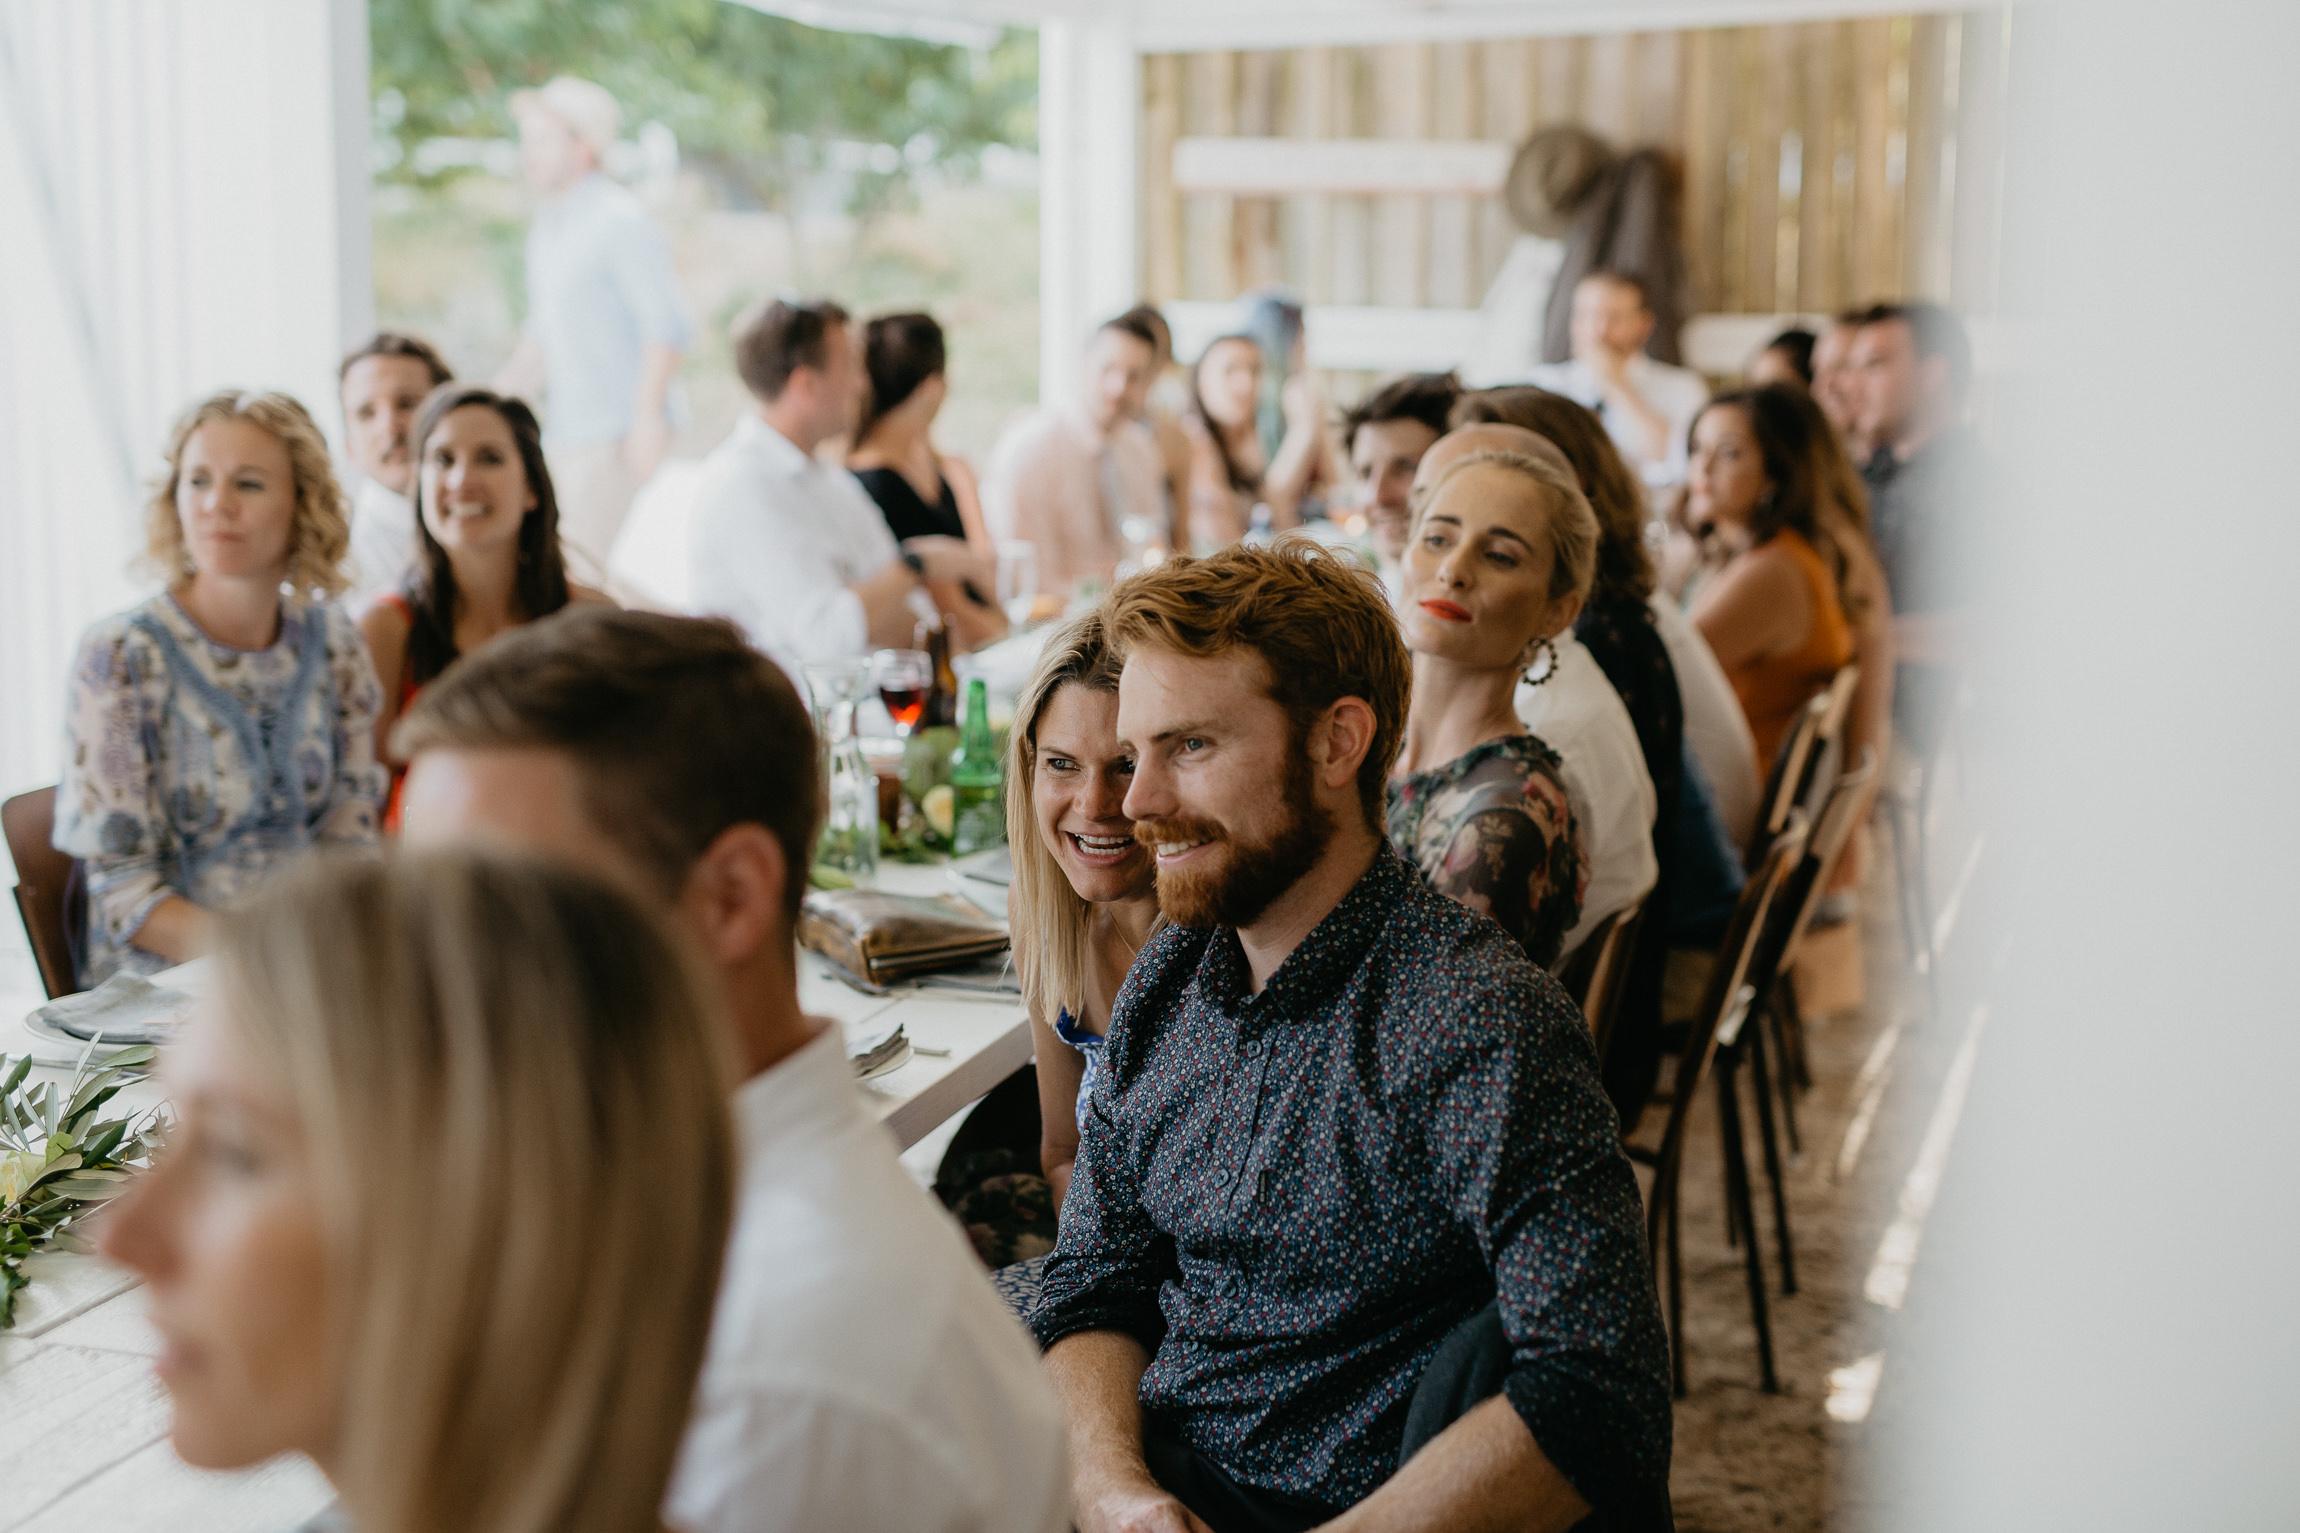 oldforestschool-wedding-blog-153.jpg